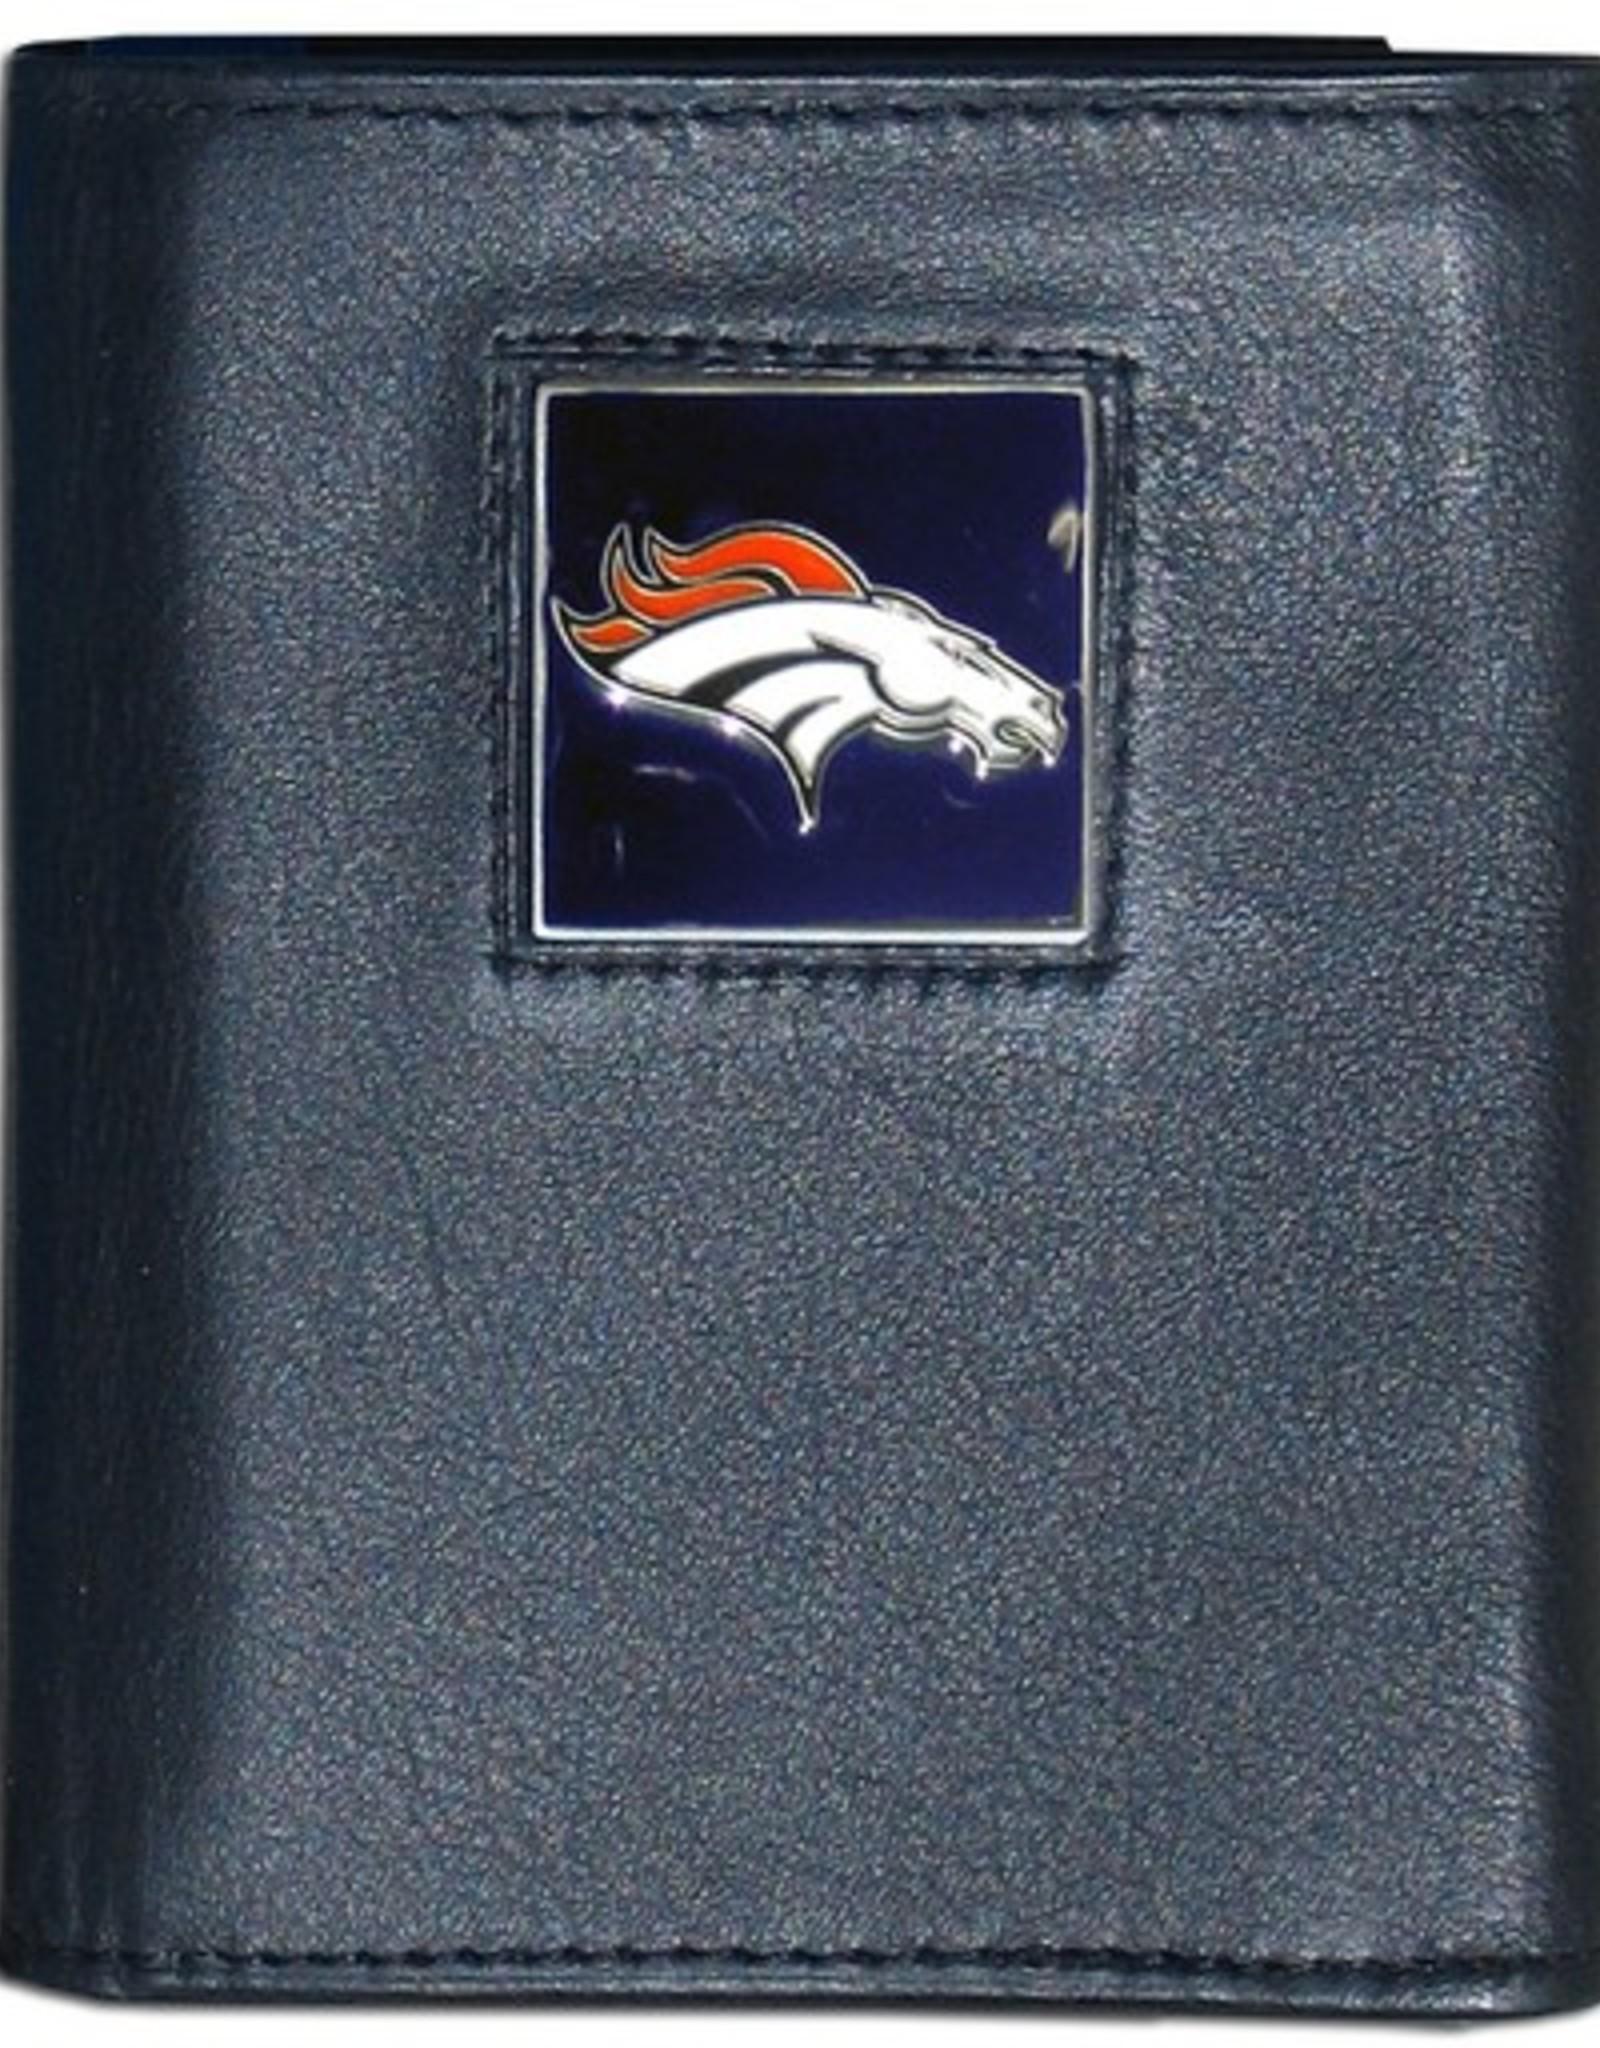 Denver Broncos Executive Black Leather Trifold Wallet